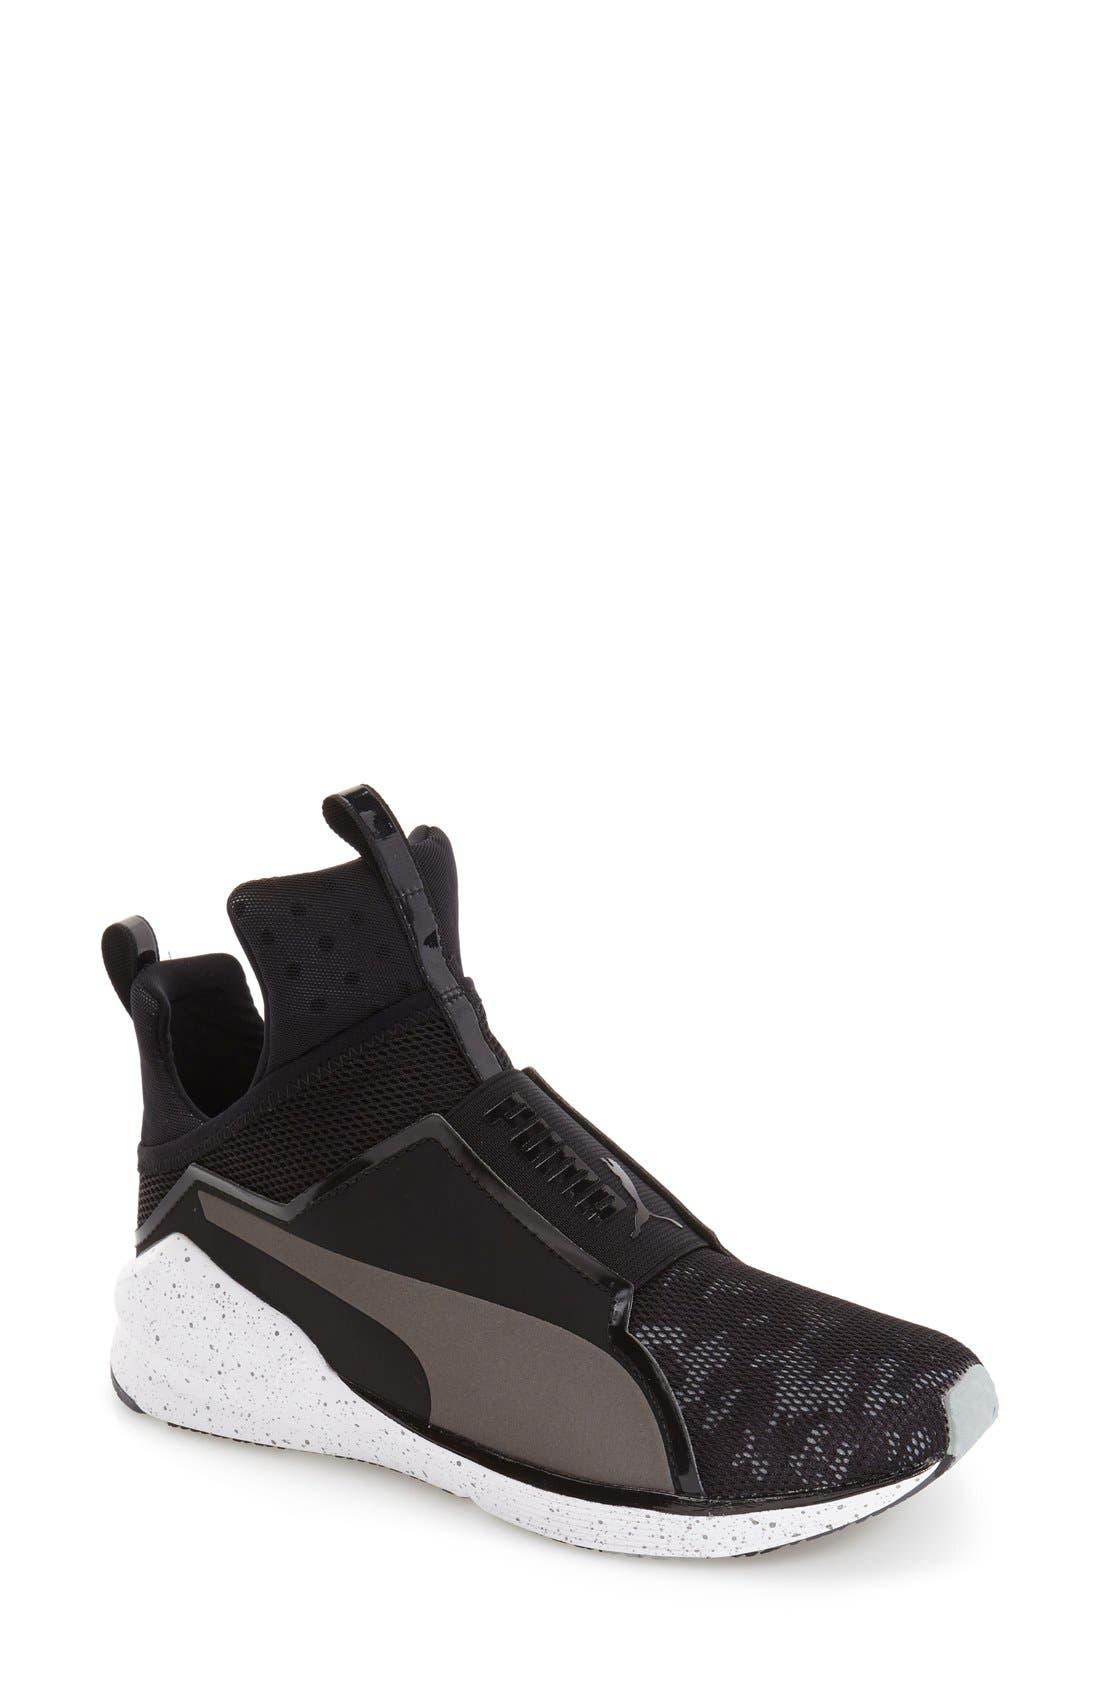 Alternate Image 1 Selected - PUMA 'Fierce Camo' Training Sneaker (Women)